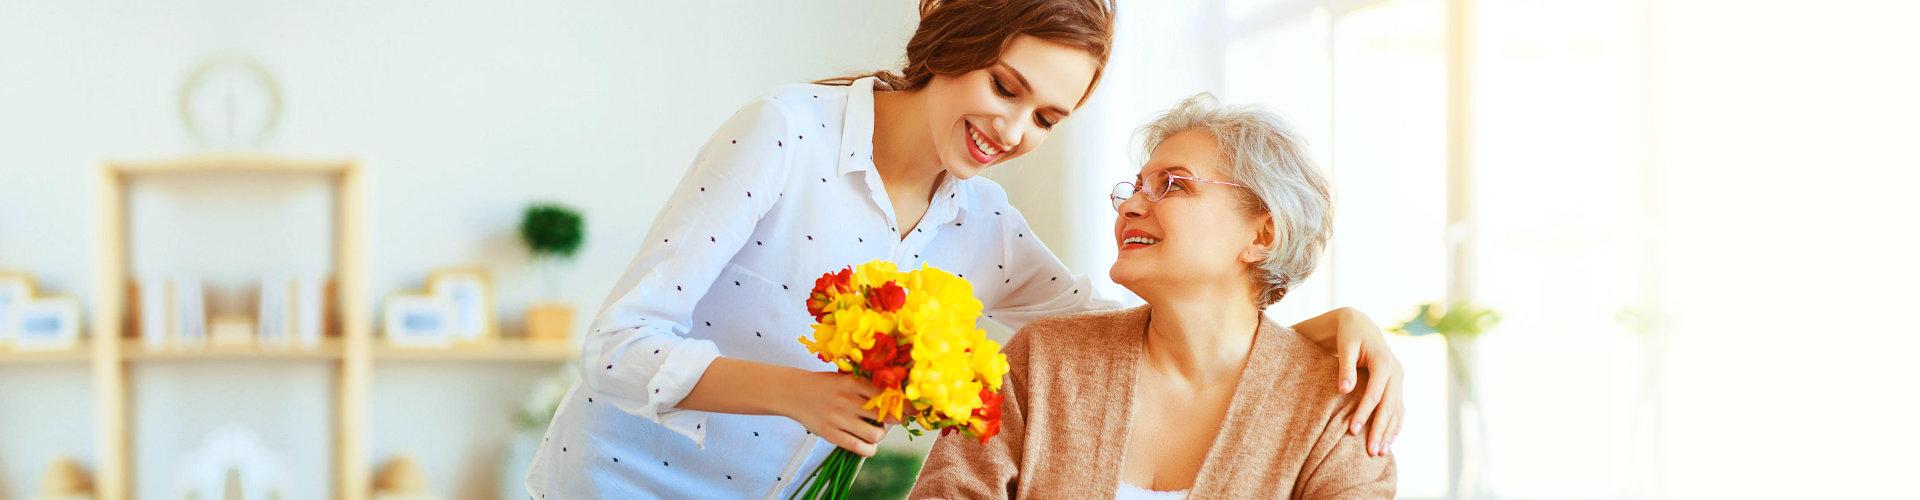 caregiver giving a senior woman flowers